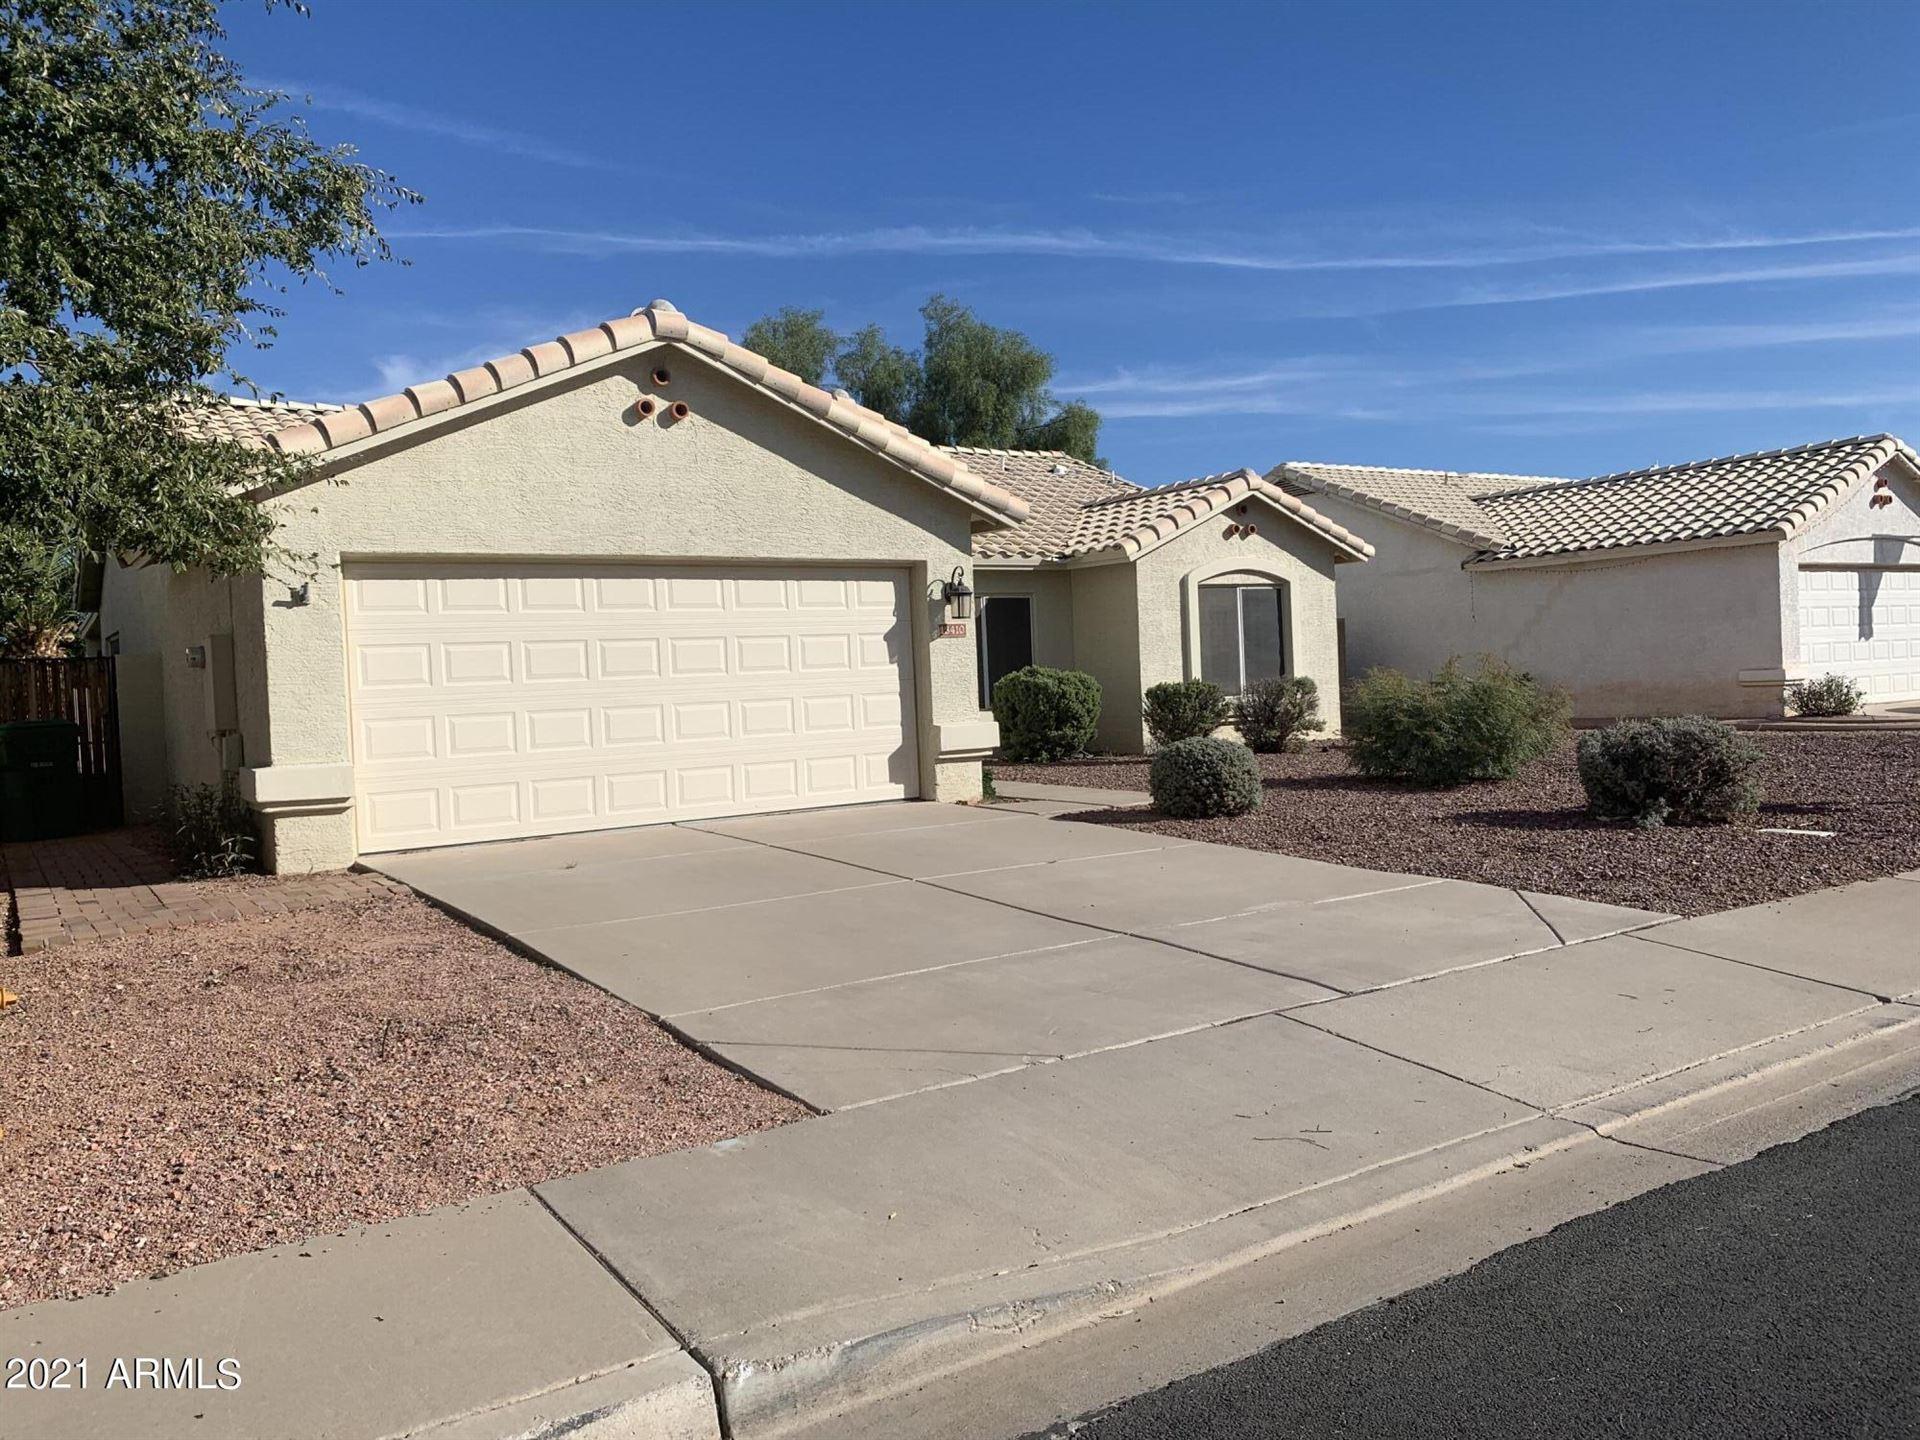 Photo of 13410 E CINDY Street, Chandler, AZ 85225 (MLS # 6311012)